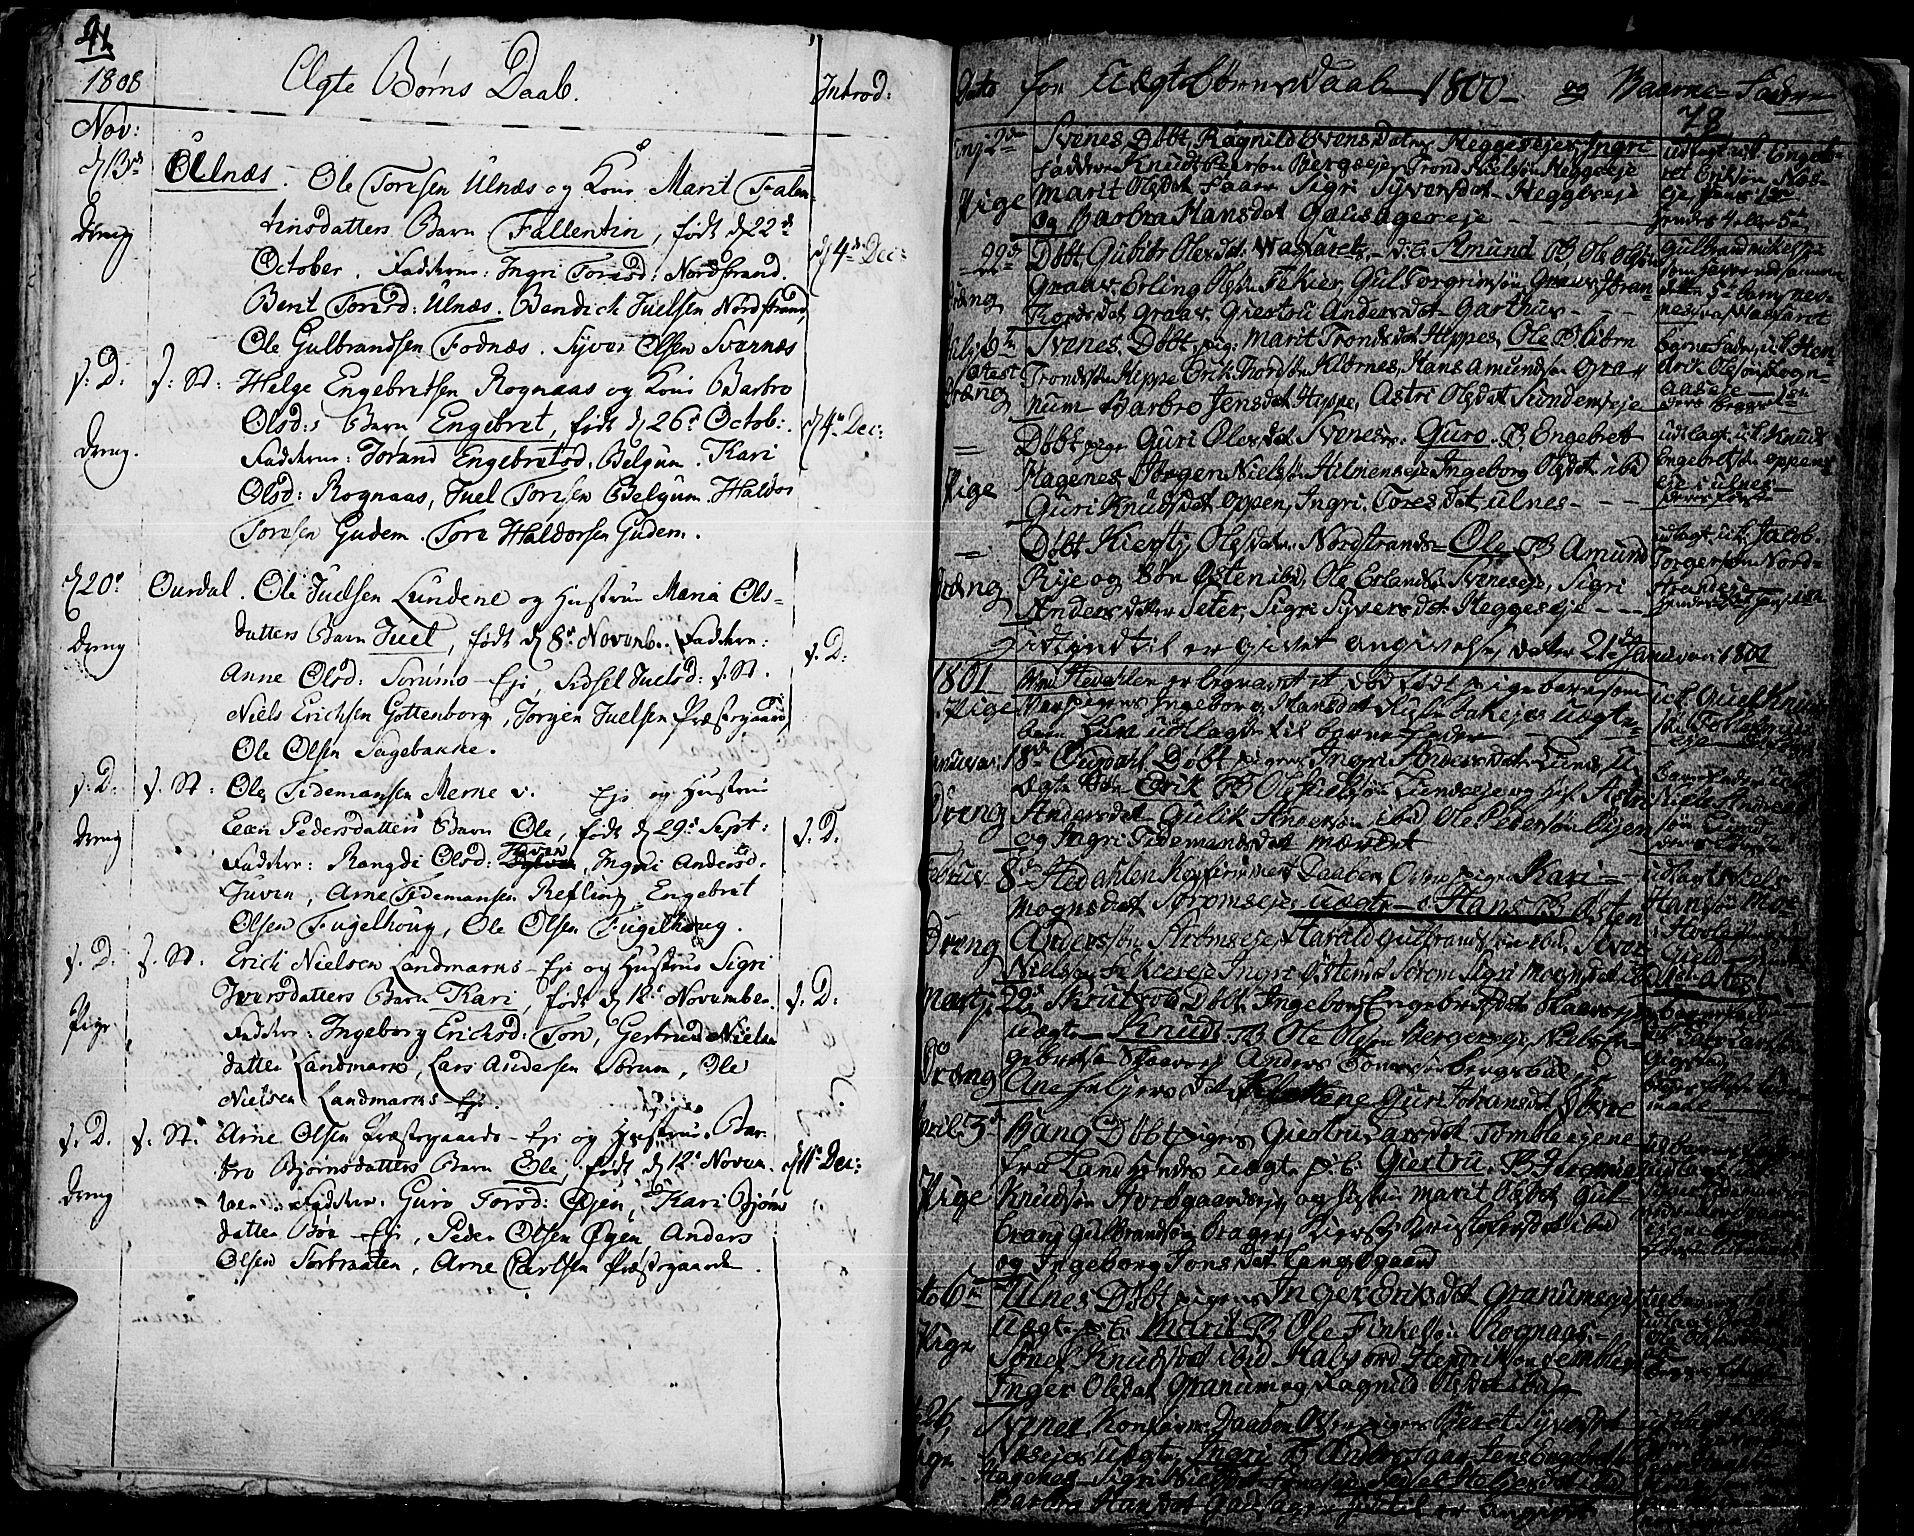 SAH, Aurdal prestekontor, Ministerialbok nr. 7, 1800-1808, s. 78